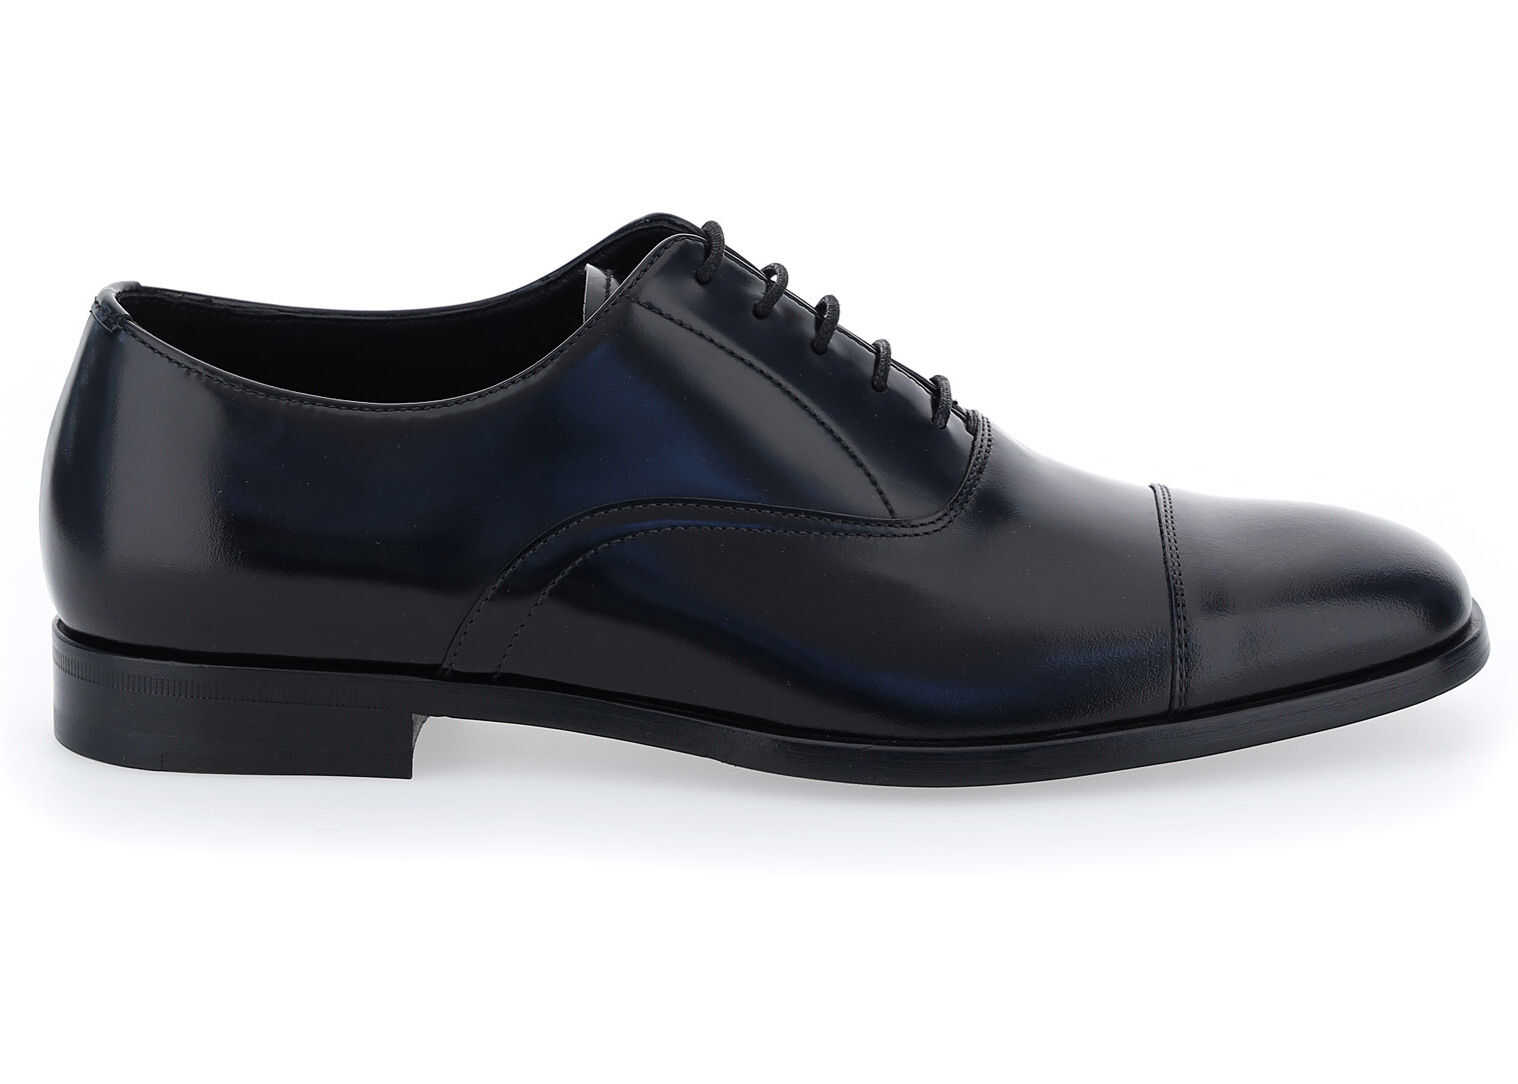 Prada Lace Up Shoes 2EB190FX001P39 NERO imagine b-mall.ro